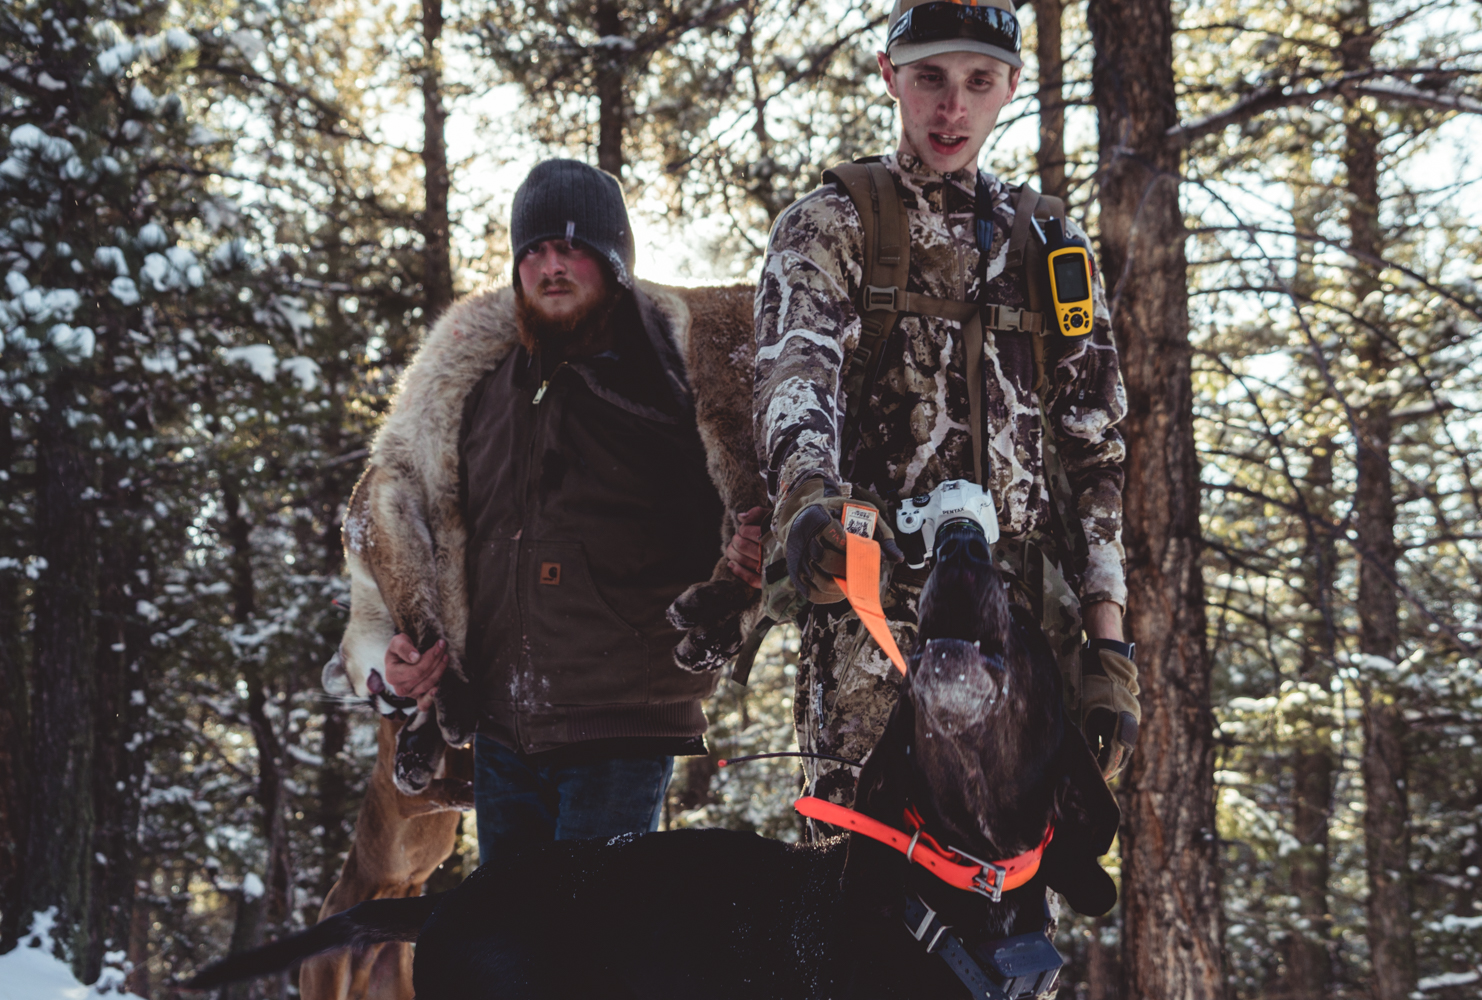 Houndsman hunting mountain lion